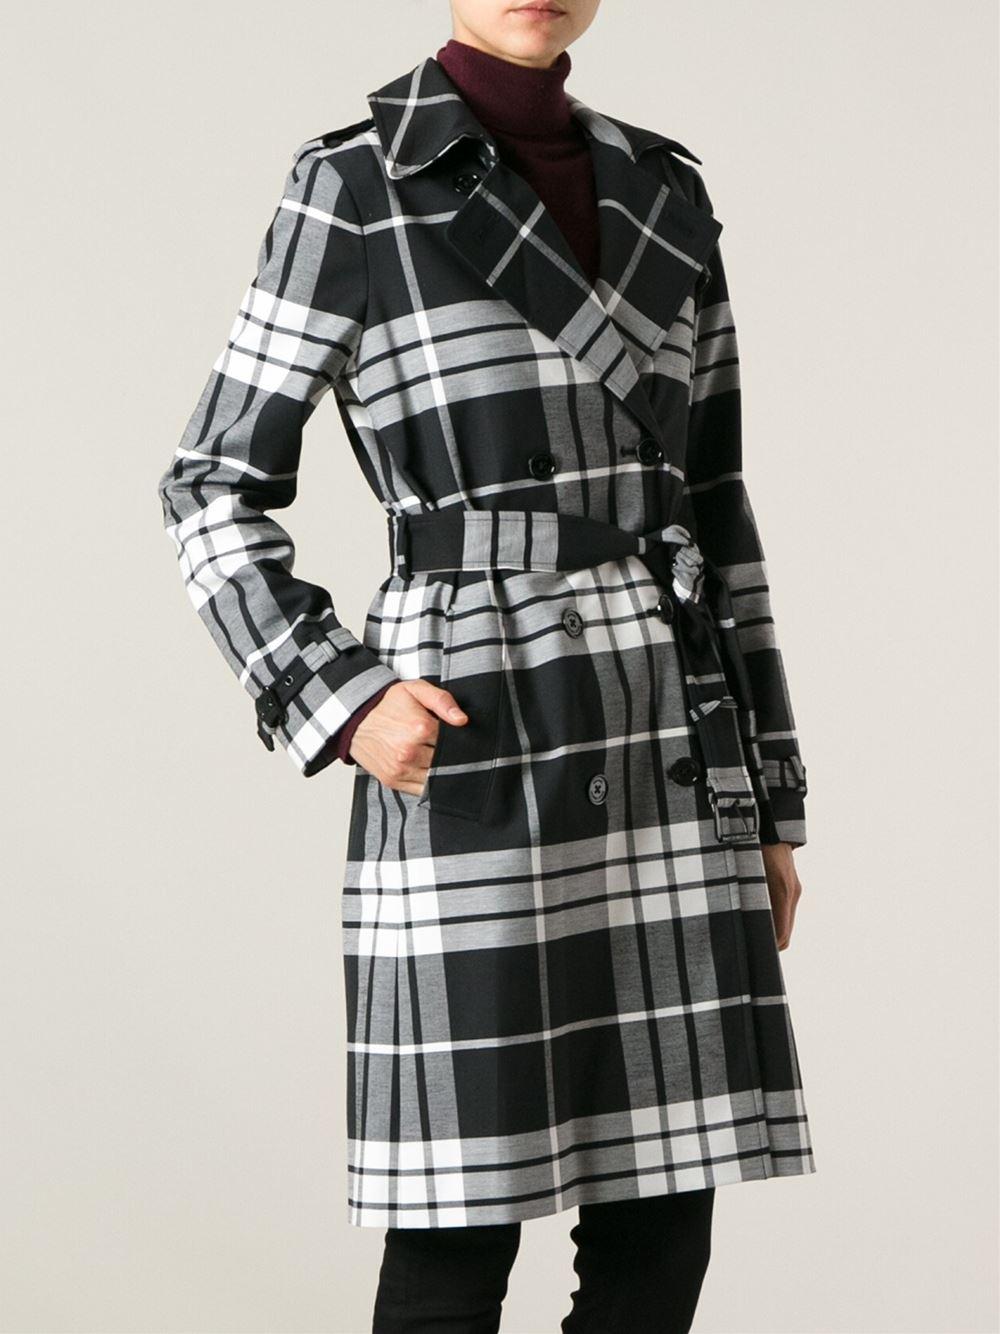 Michael kors Plaid Trench Coat in Black | Lyst